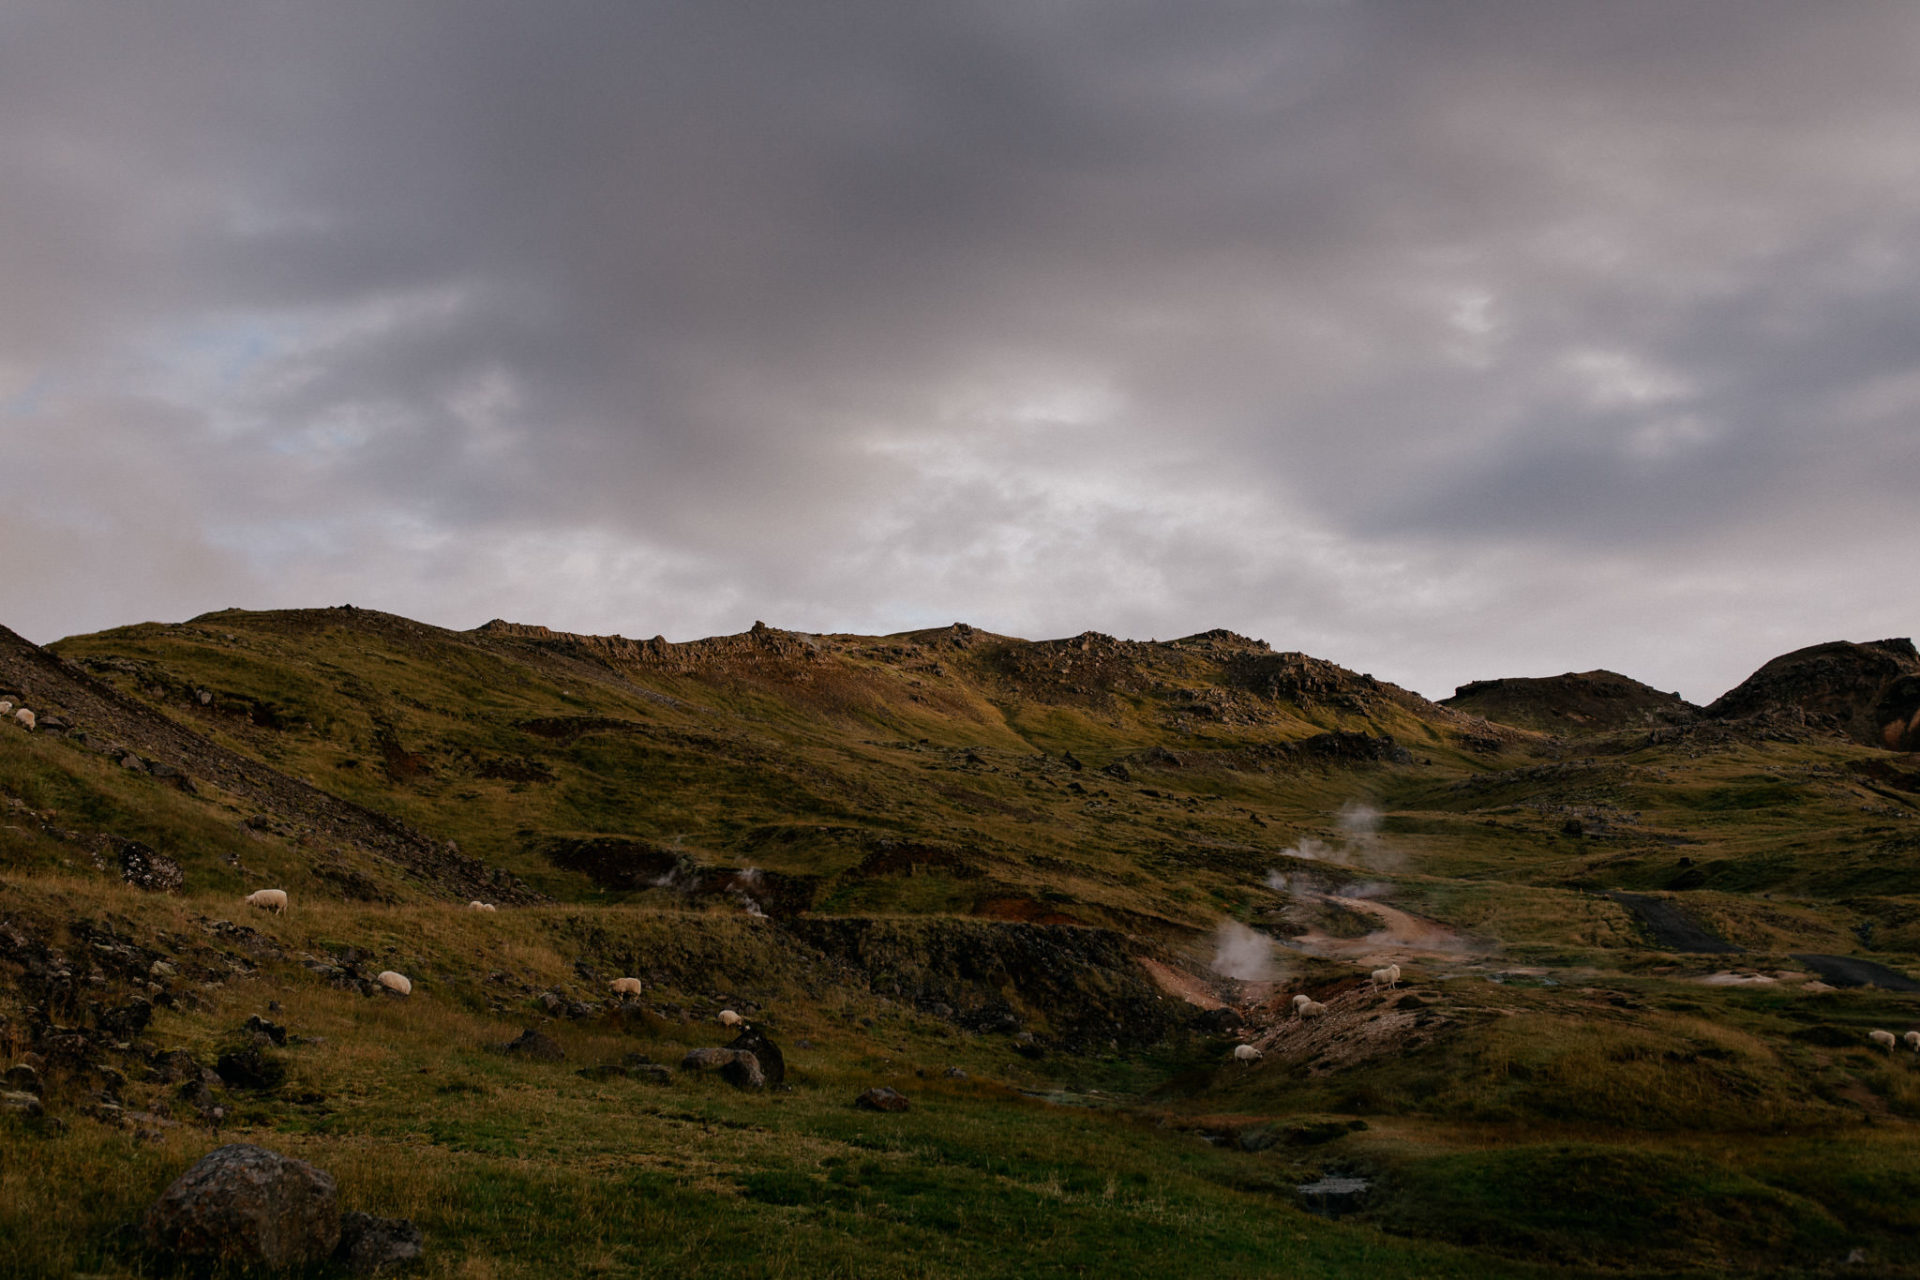 icelandic landscape-hot-springs-steam-geothermal-springs-sunrise-hike-hot-river